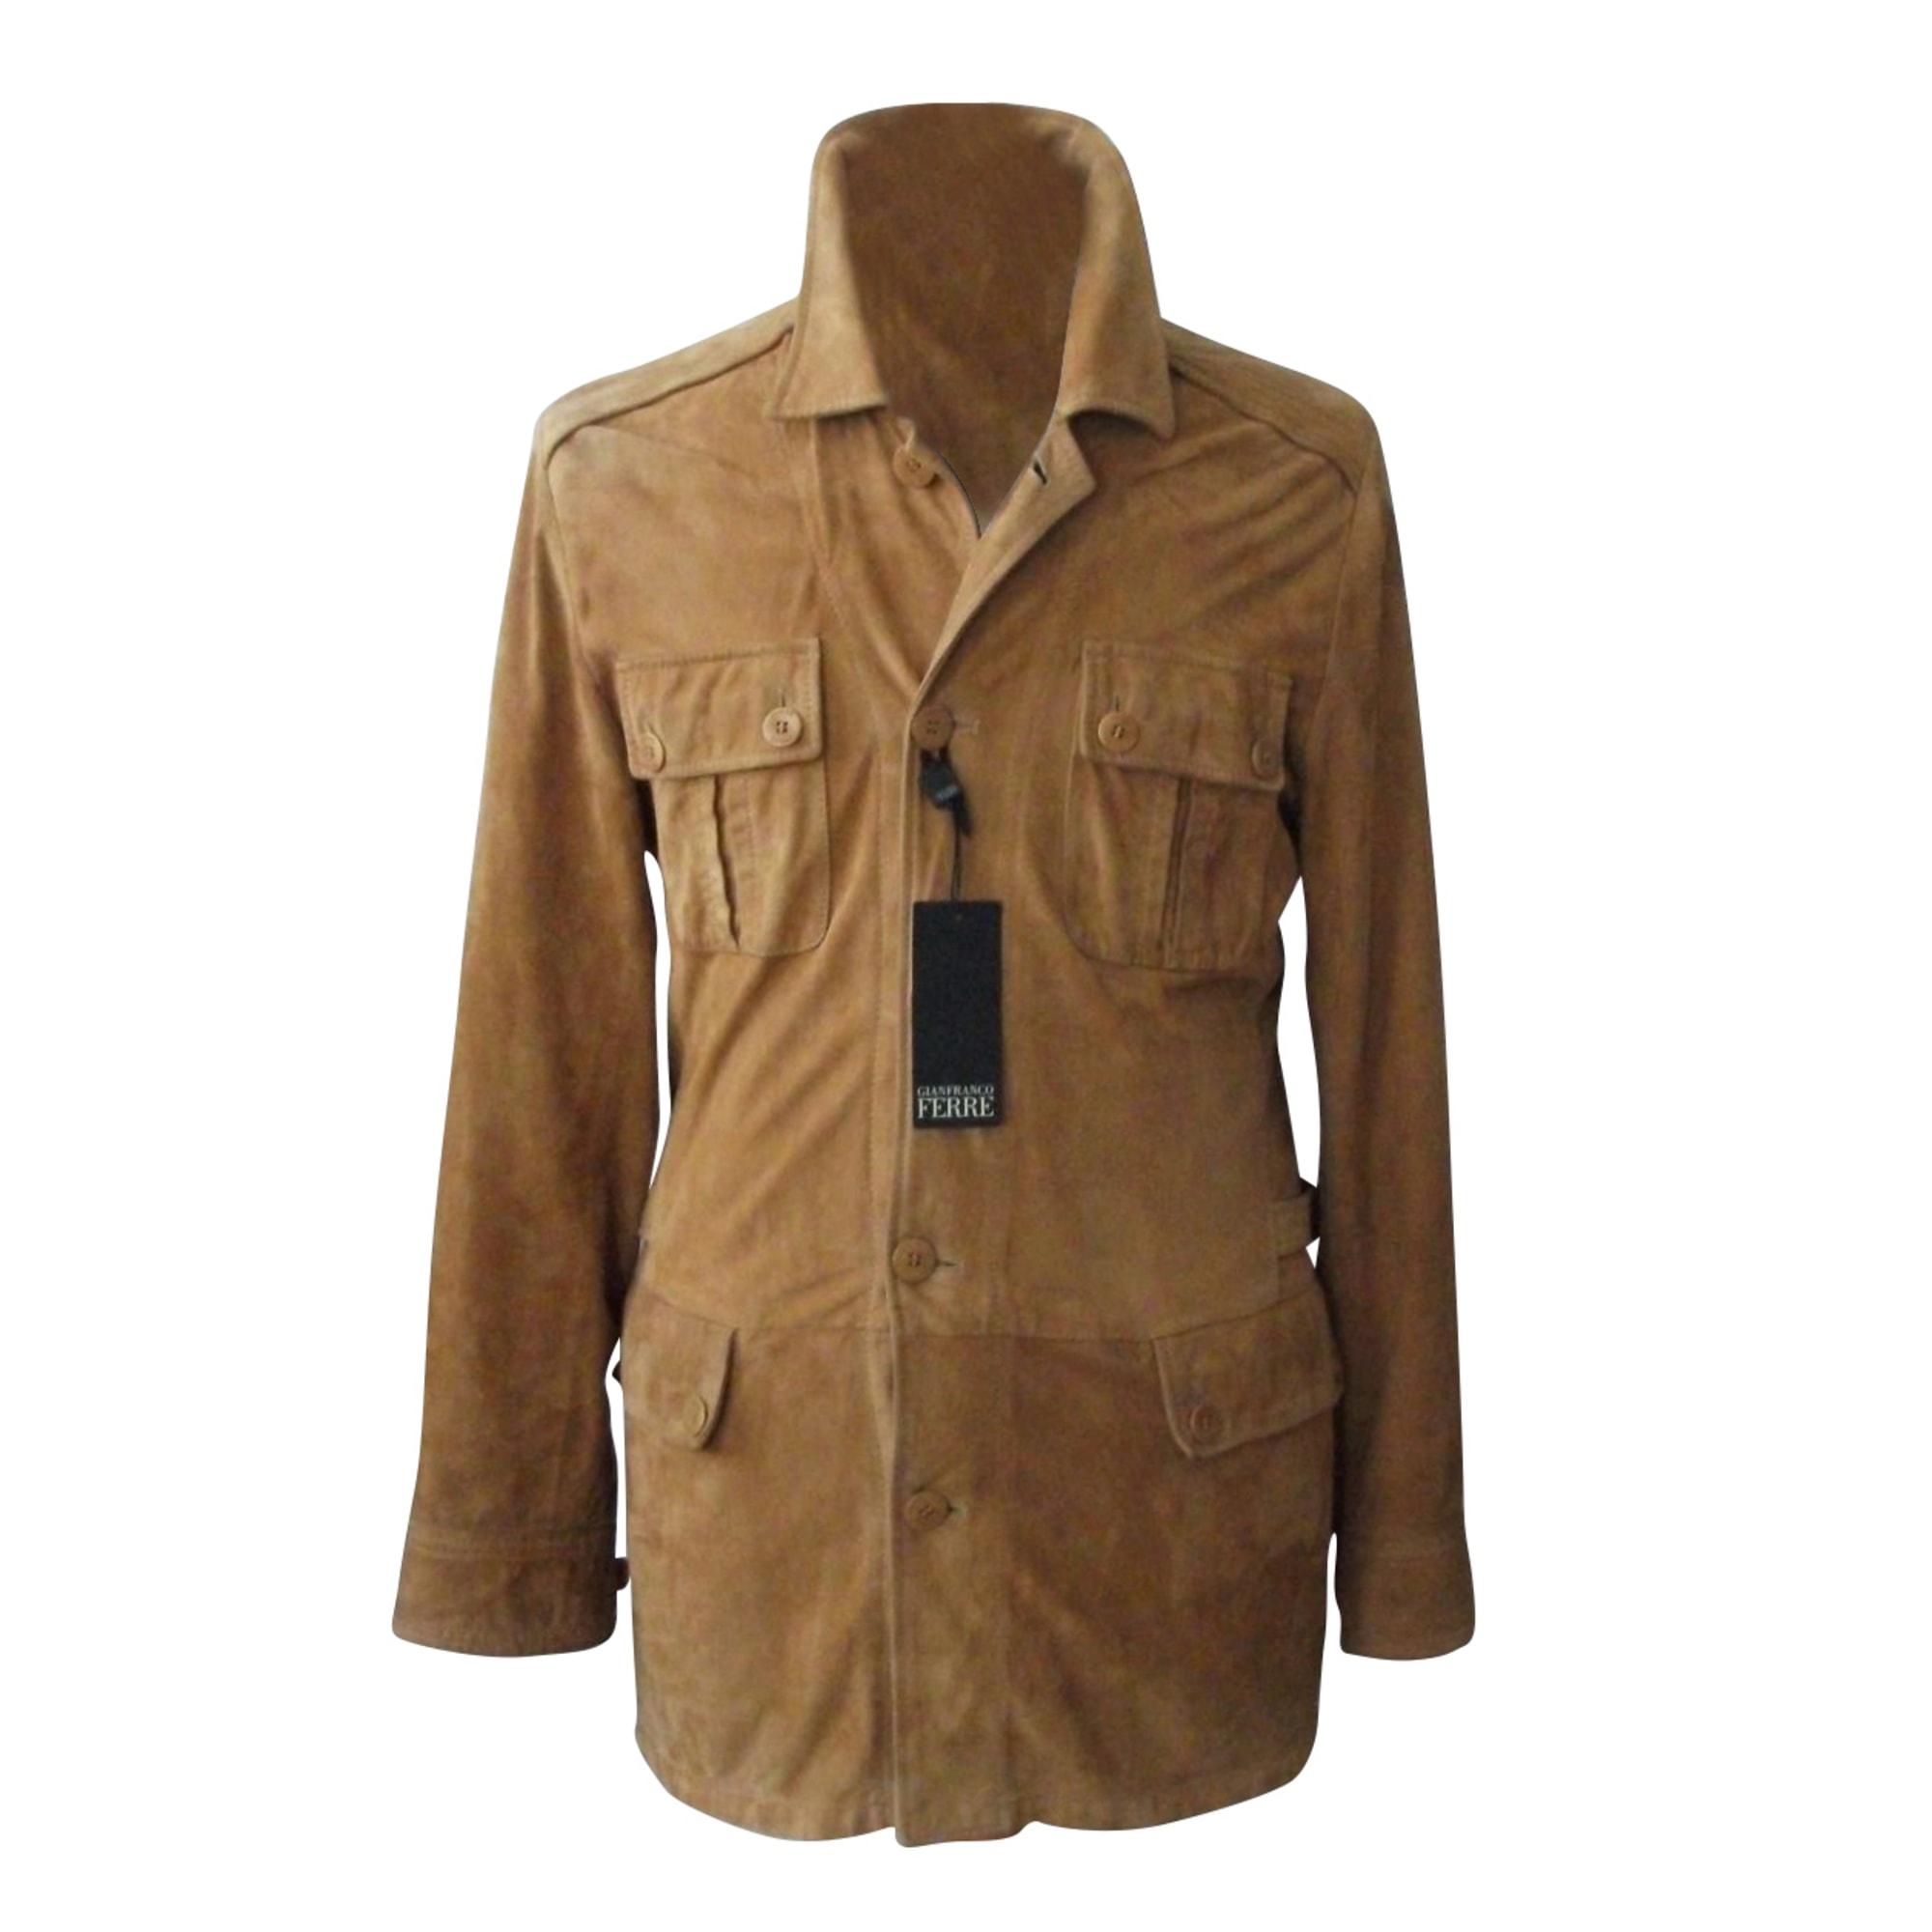 Veste en cuir GIANFRANCO FERRE Doré, bronze, cuivre